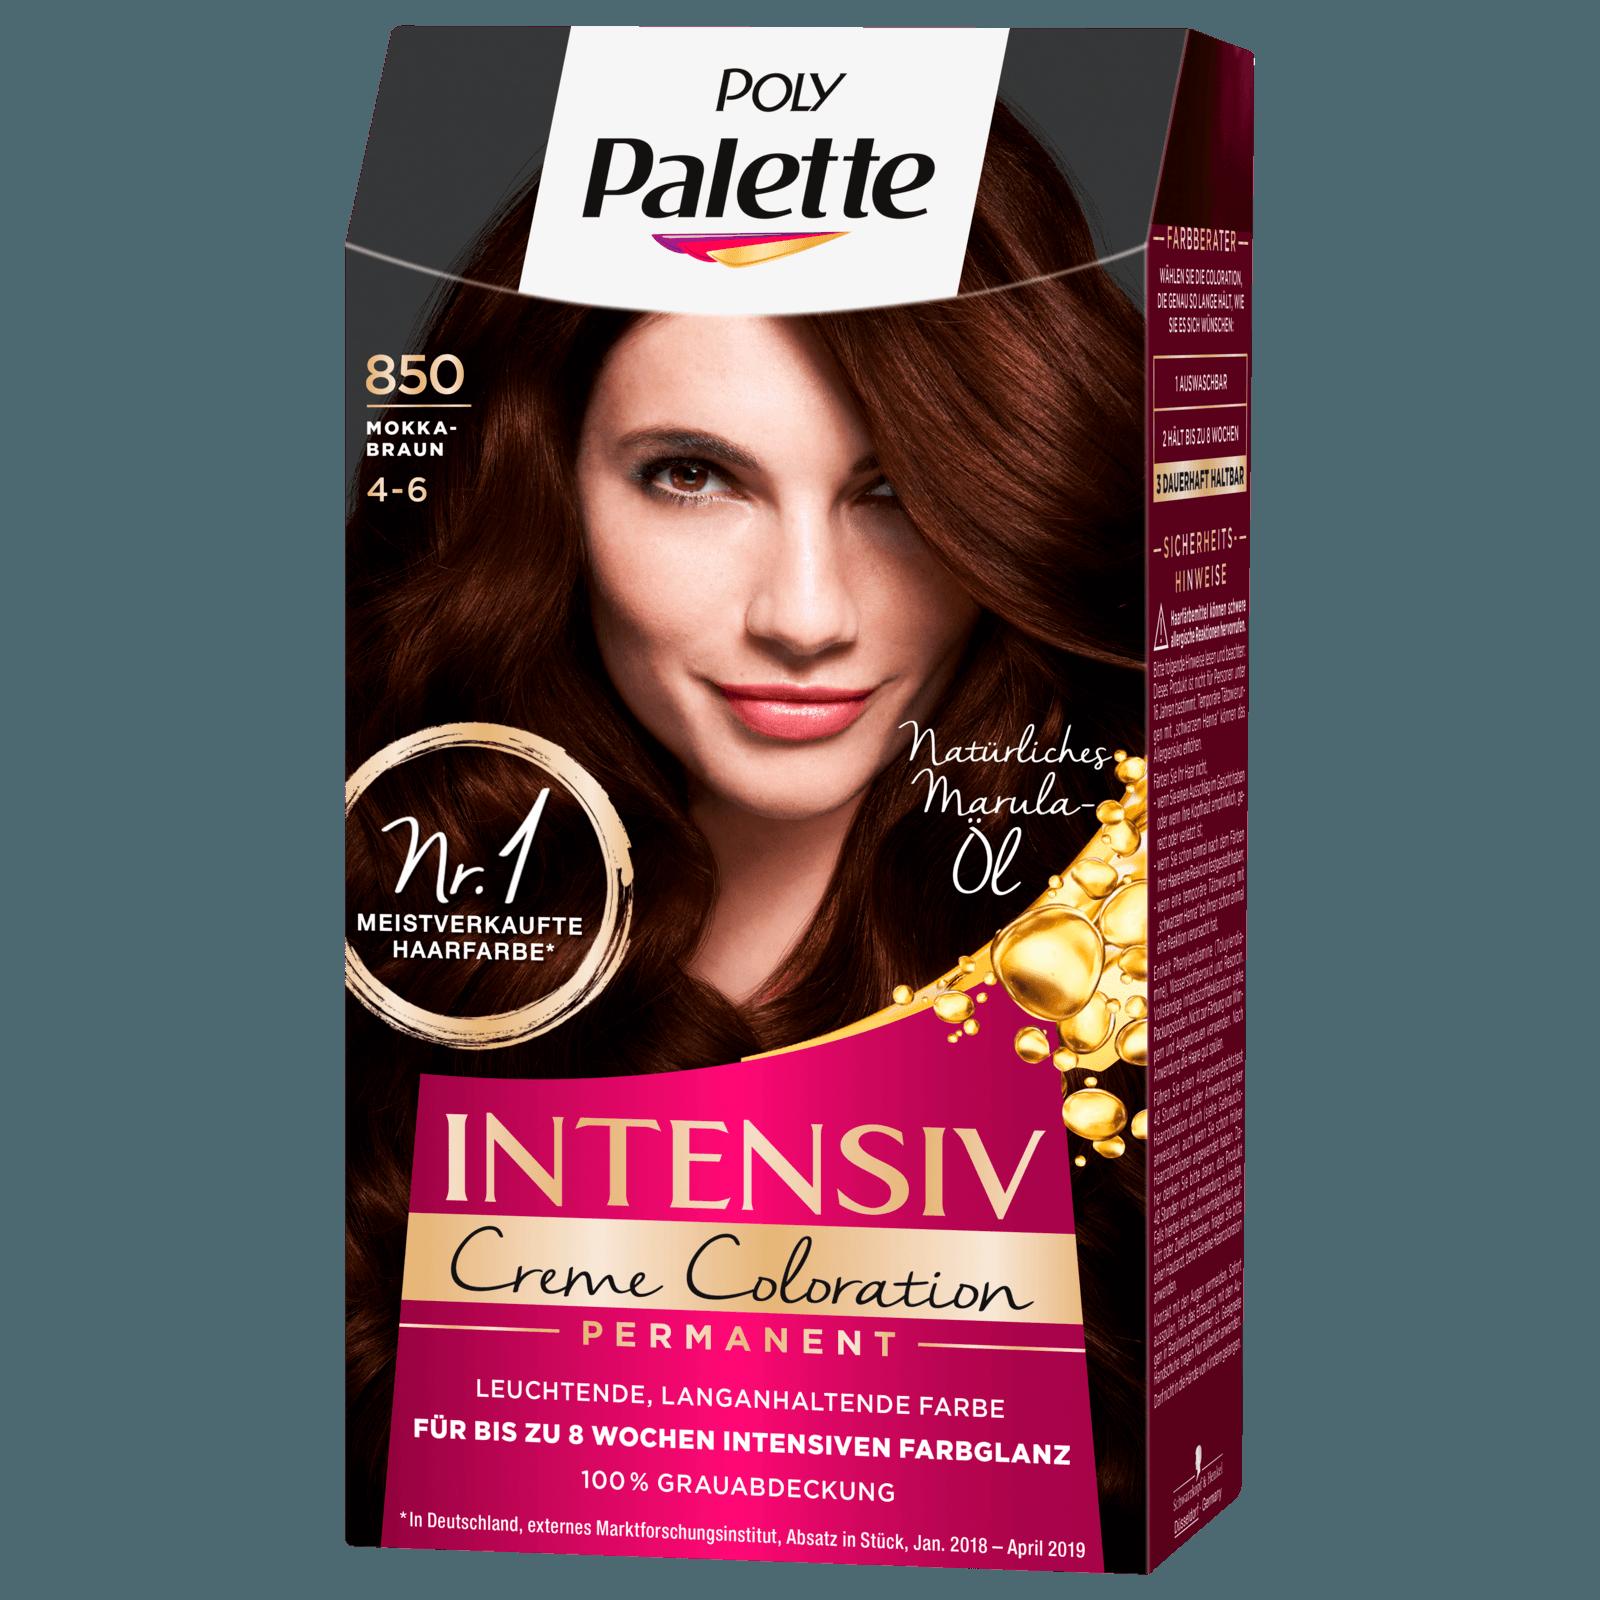 Poly Palette Intensiv Creme Coloartion 850 Mokkabraun 115ml Bei Rewe